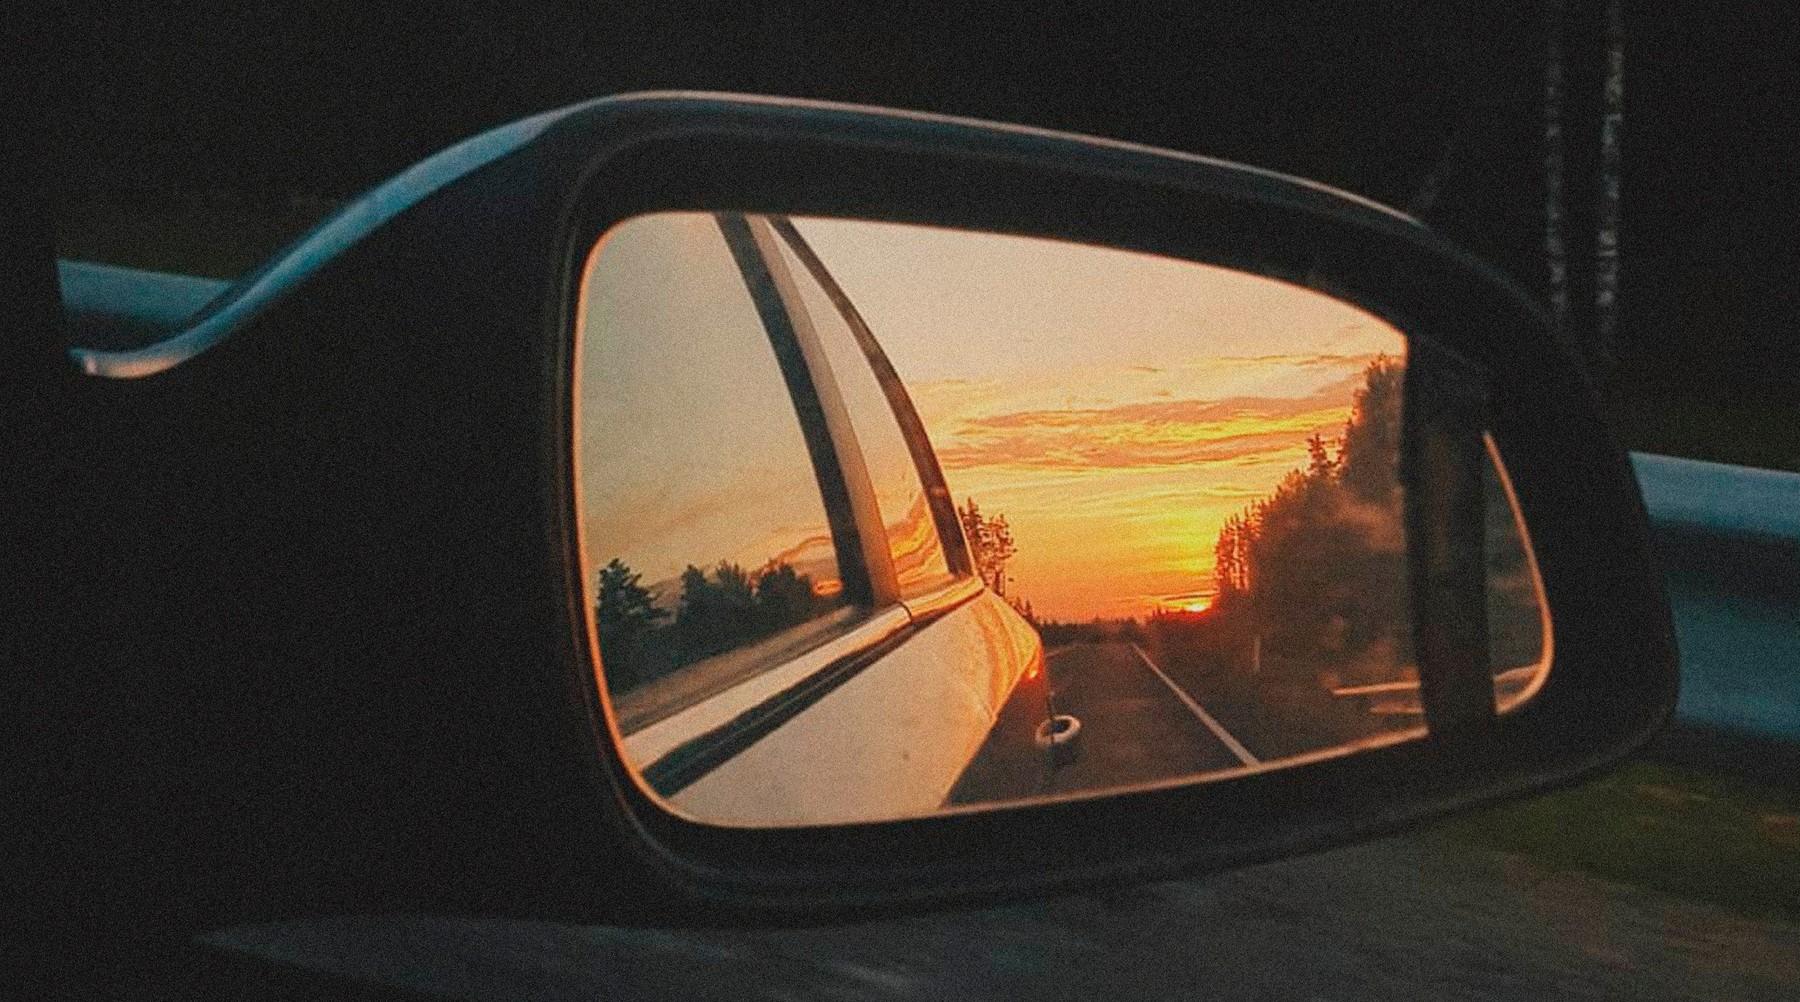 Notice sunsets